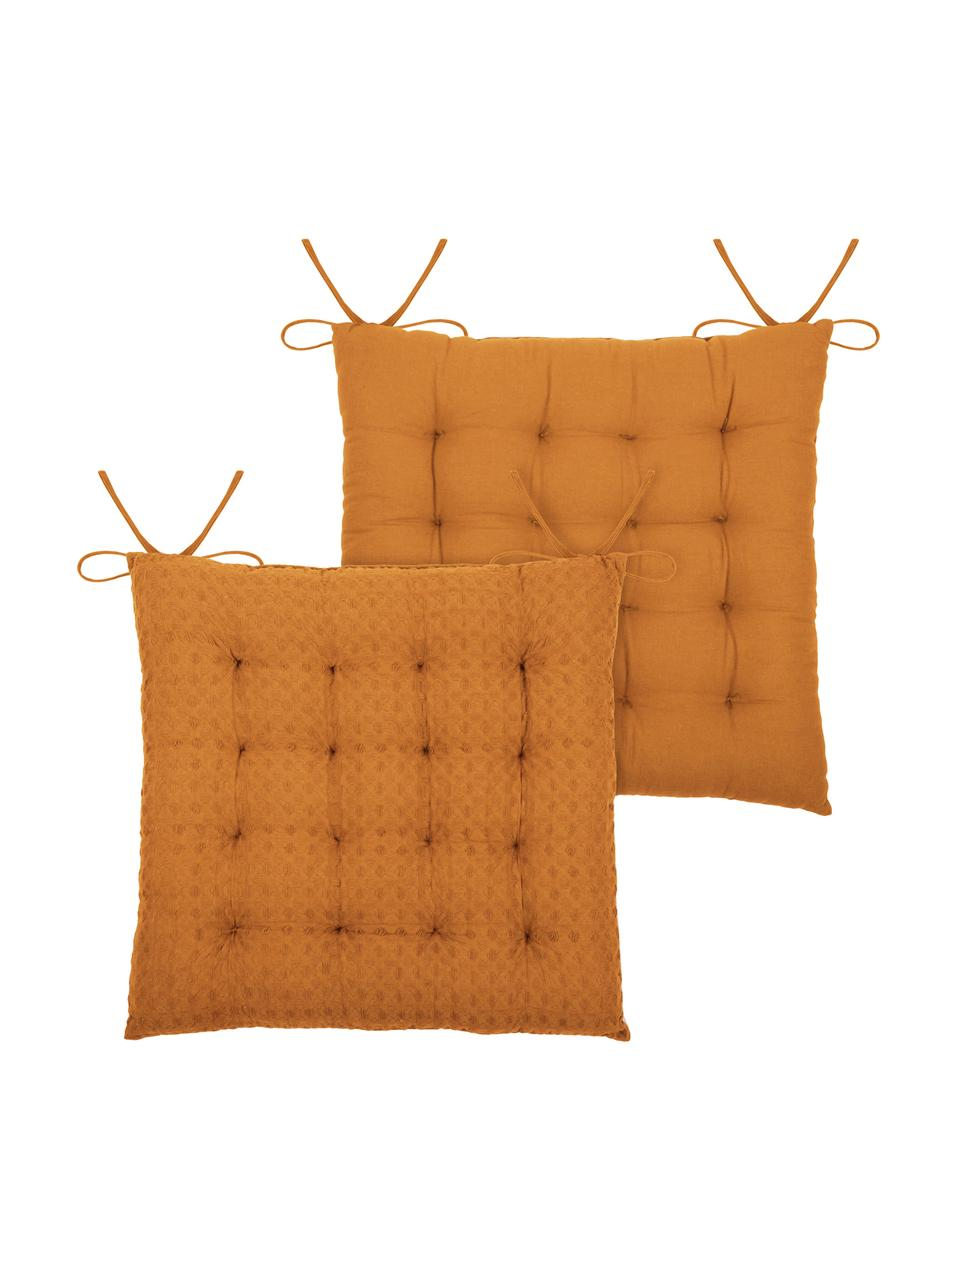 Coussin de chaise 40x40 jaune moutarde Gopher, Jaune moutarde